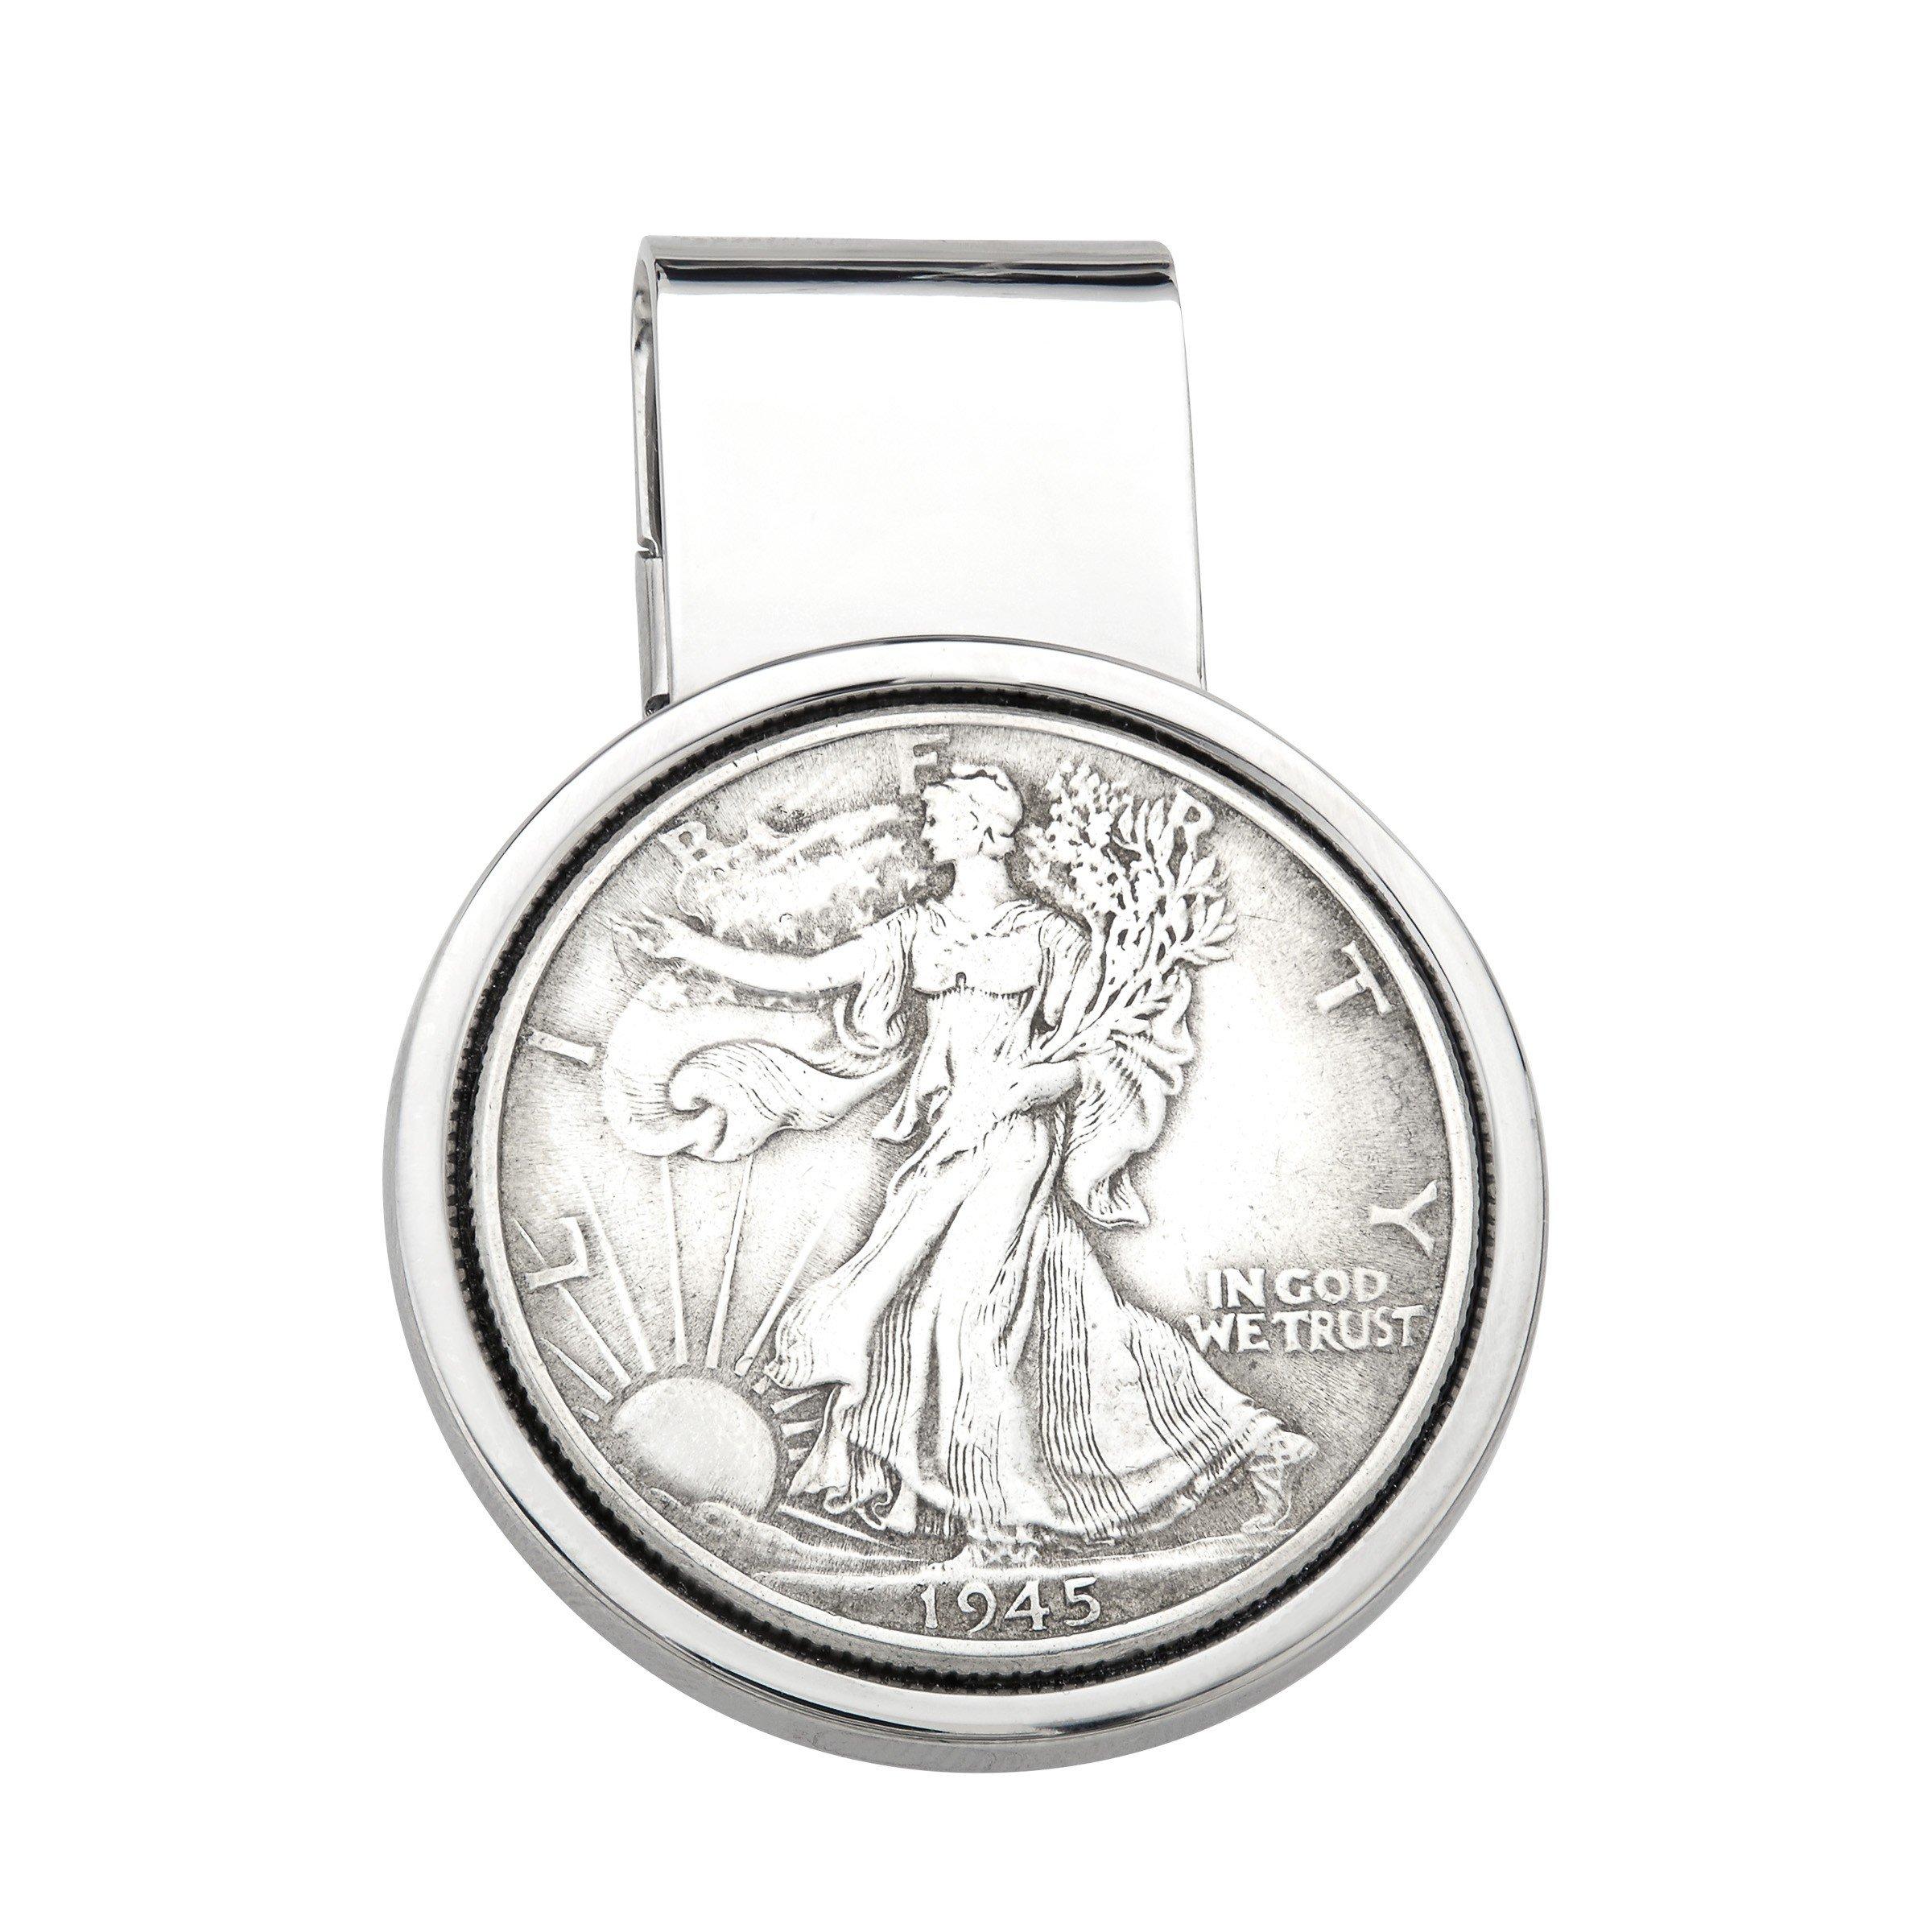 Dolan Bullock Walking Liberty Coin Money Clip in Sterling Silver